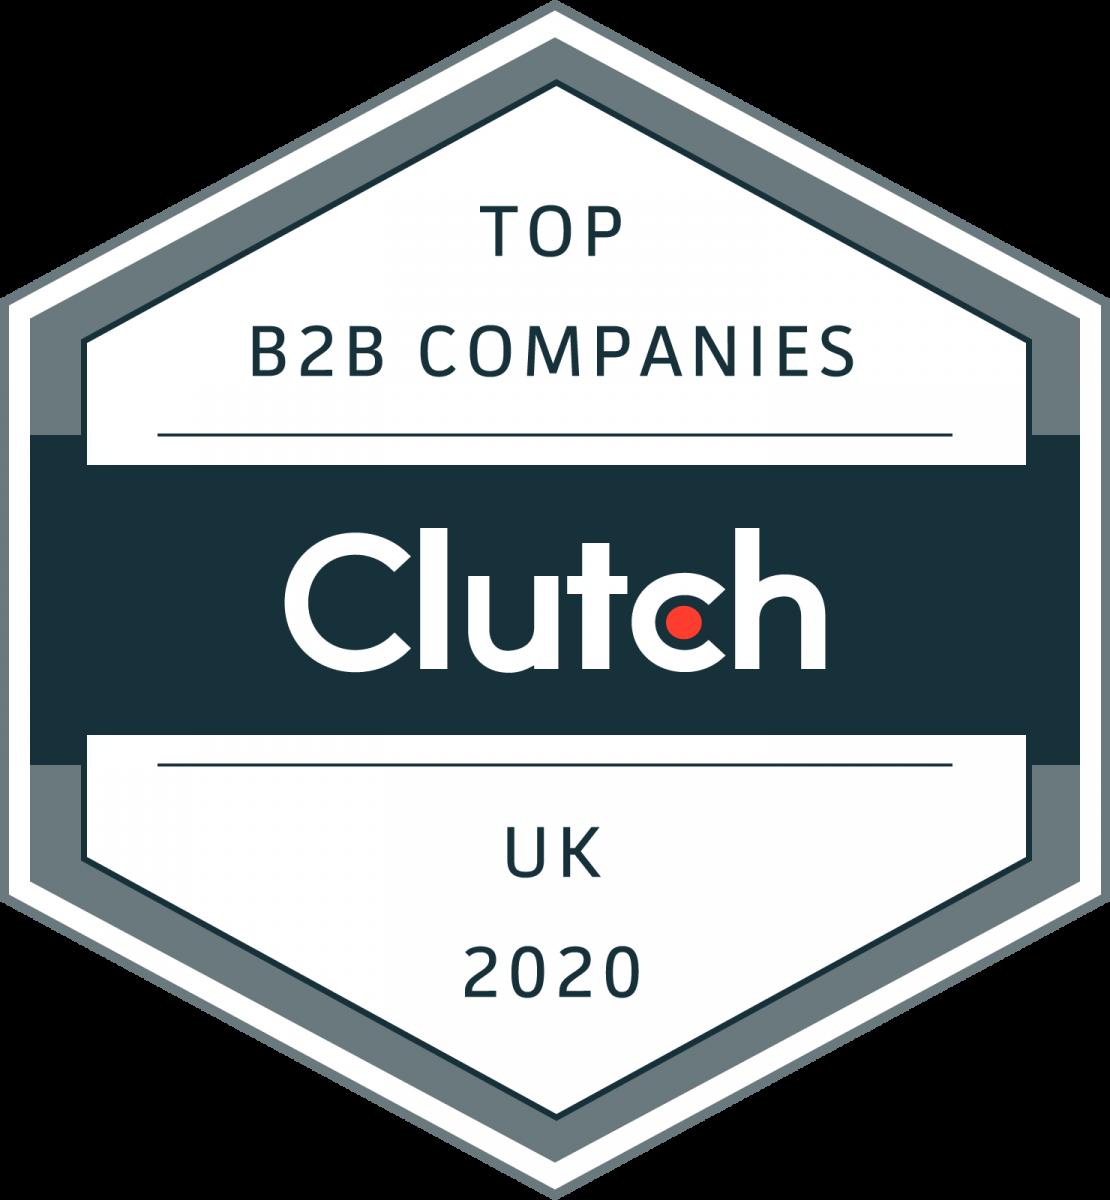 Top B2B Companies 2020 United Kingdom